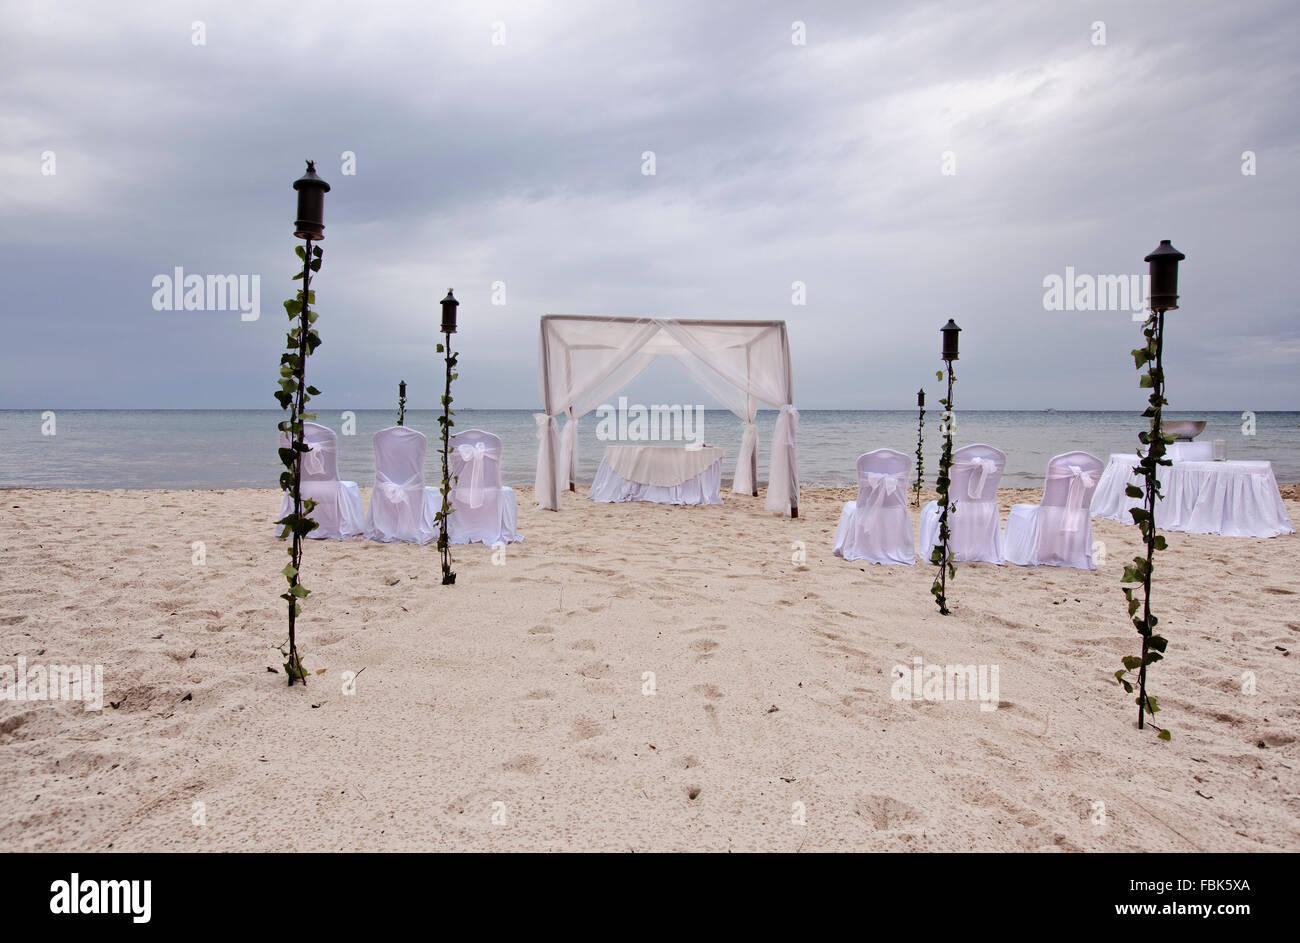 outdoor beach wedding gazebo - Stock Image